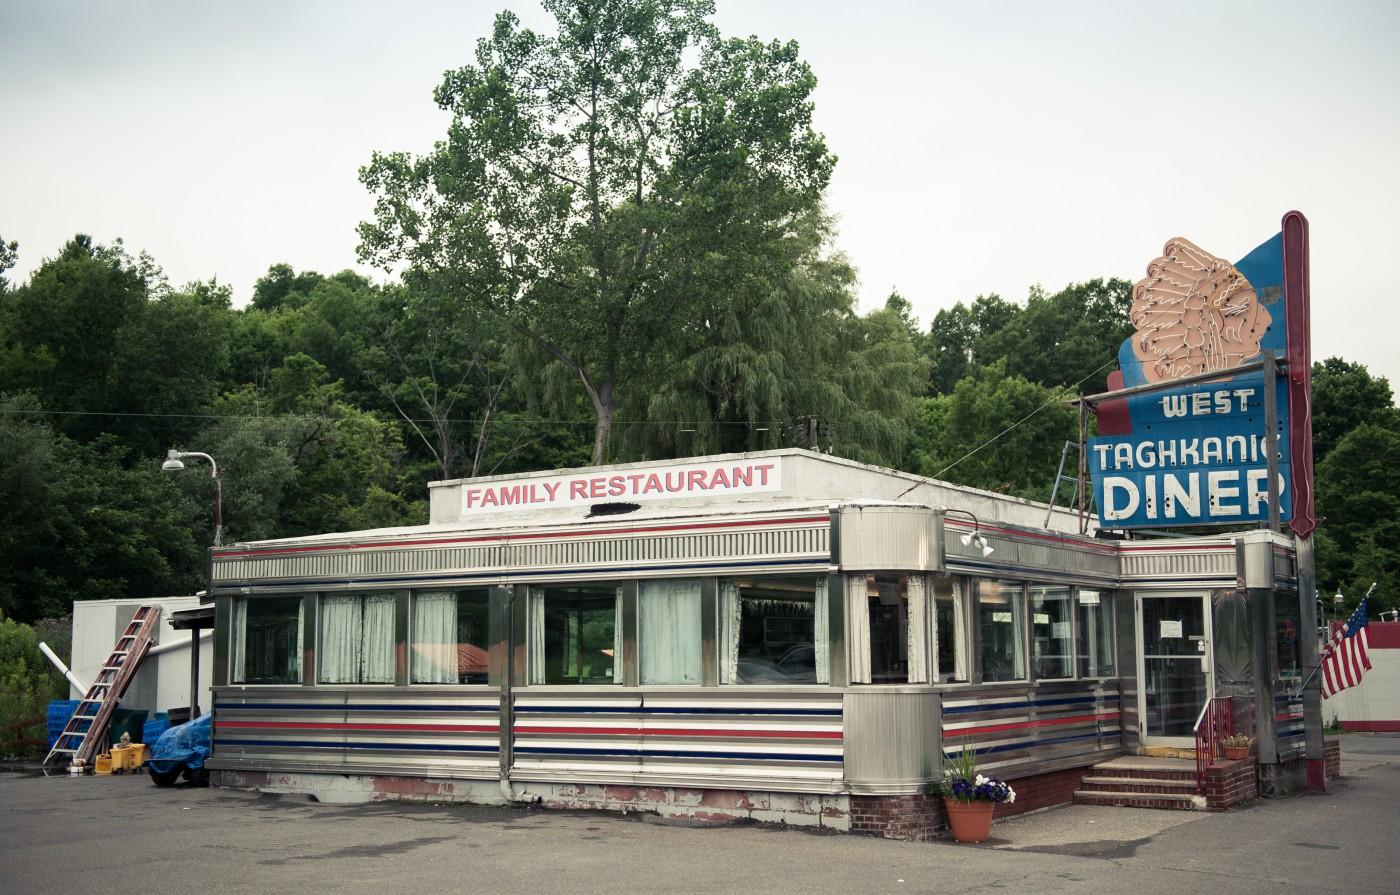 Jordan Nahmias, </span><span><em>West Taghkanic Diner</em>, </span><span>2016, 47 x 31&quot;.